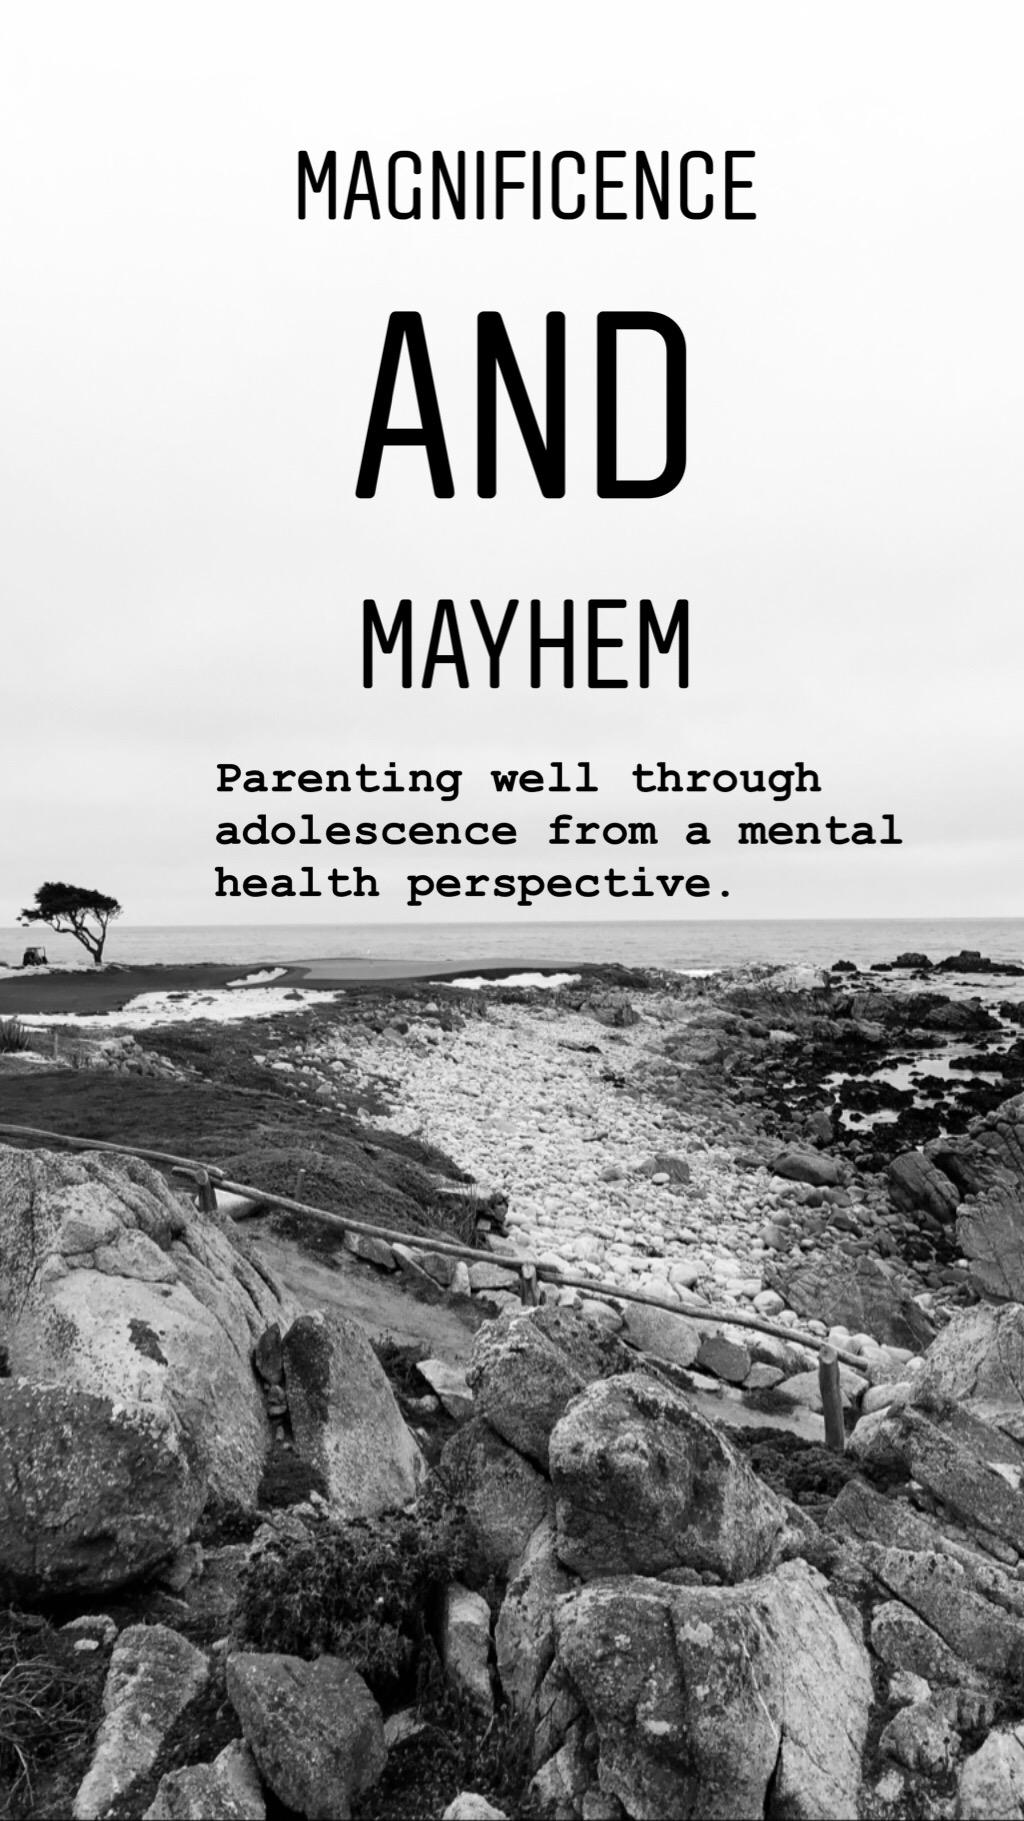 Magnificence and Mayhem